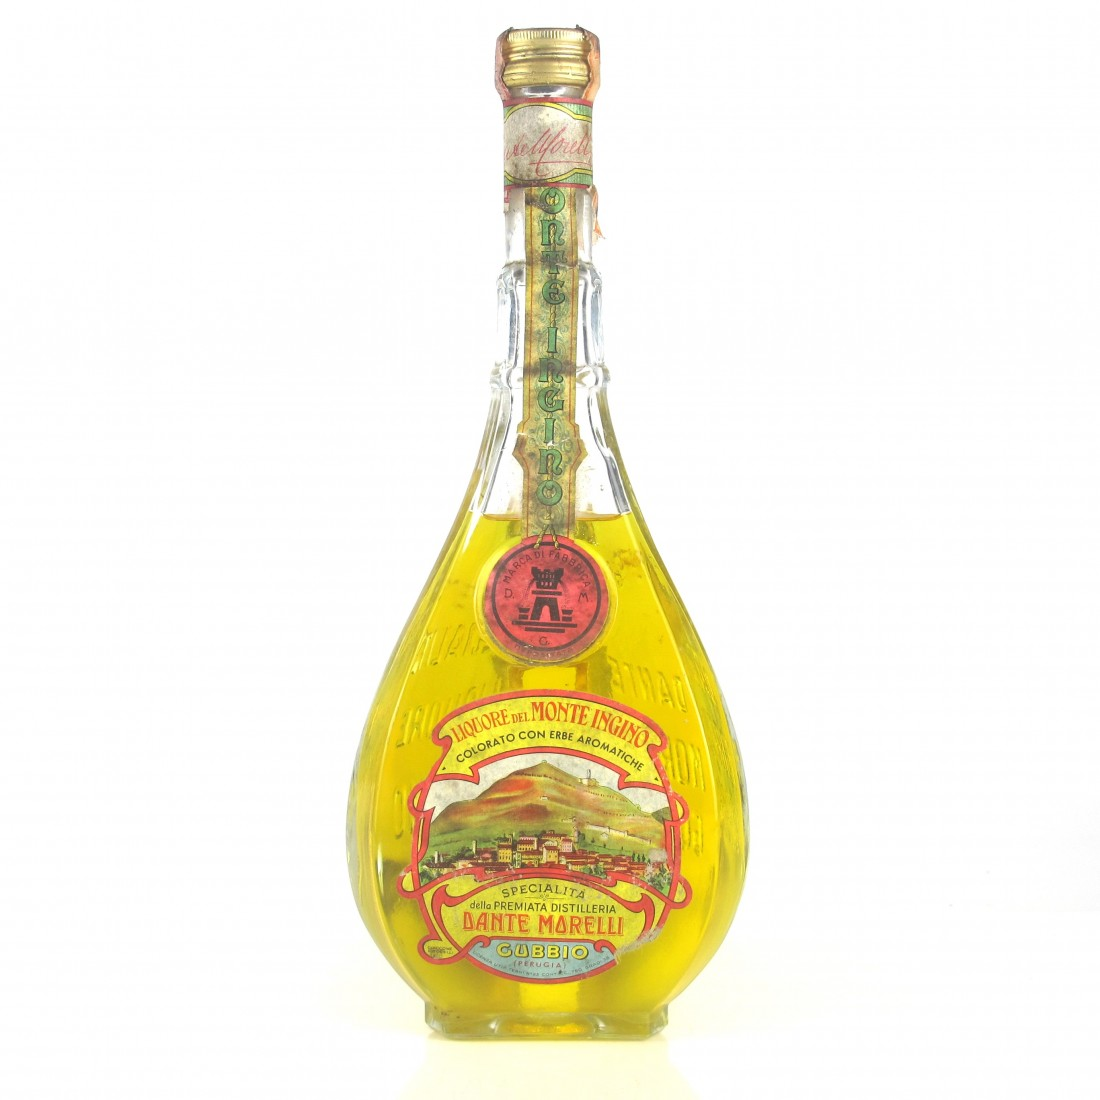 Dante Marelli Liquore del Monte Ingino 1960s